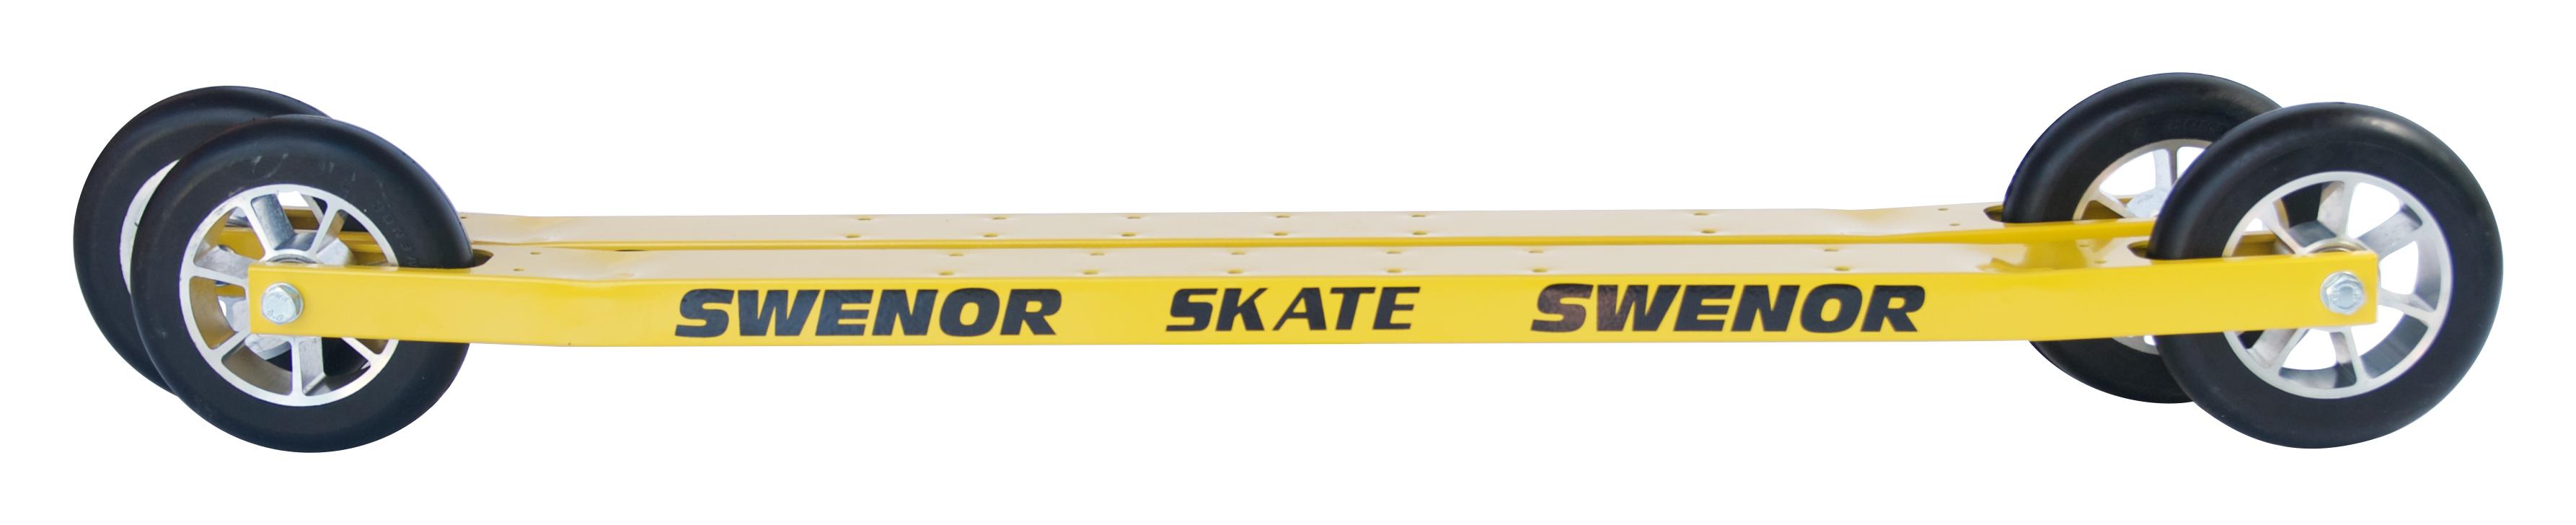 Swenor Skate stamme